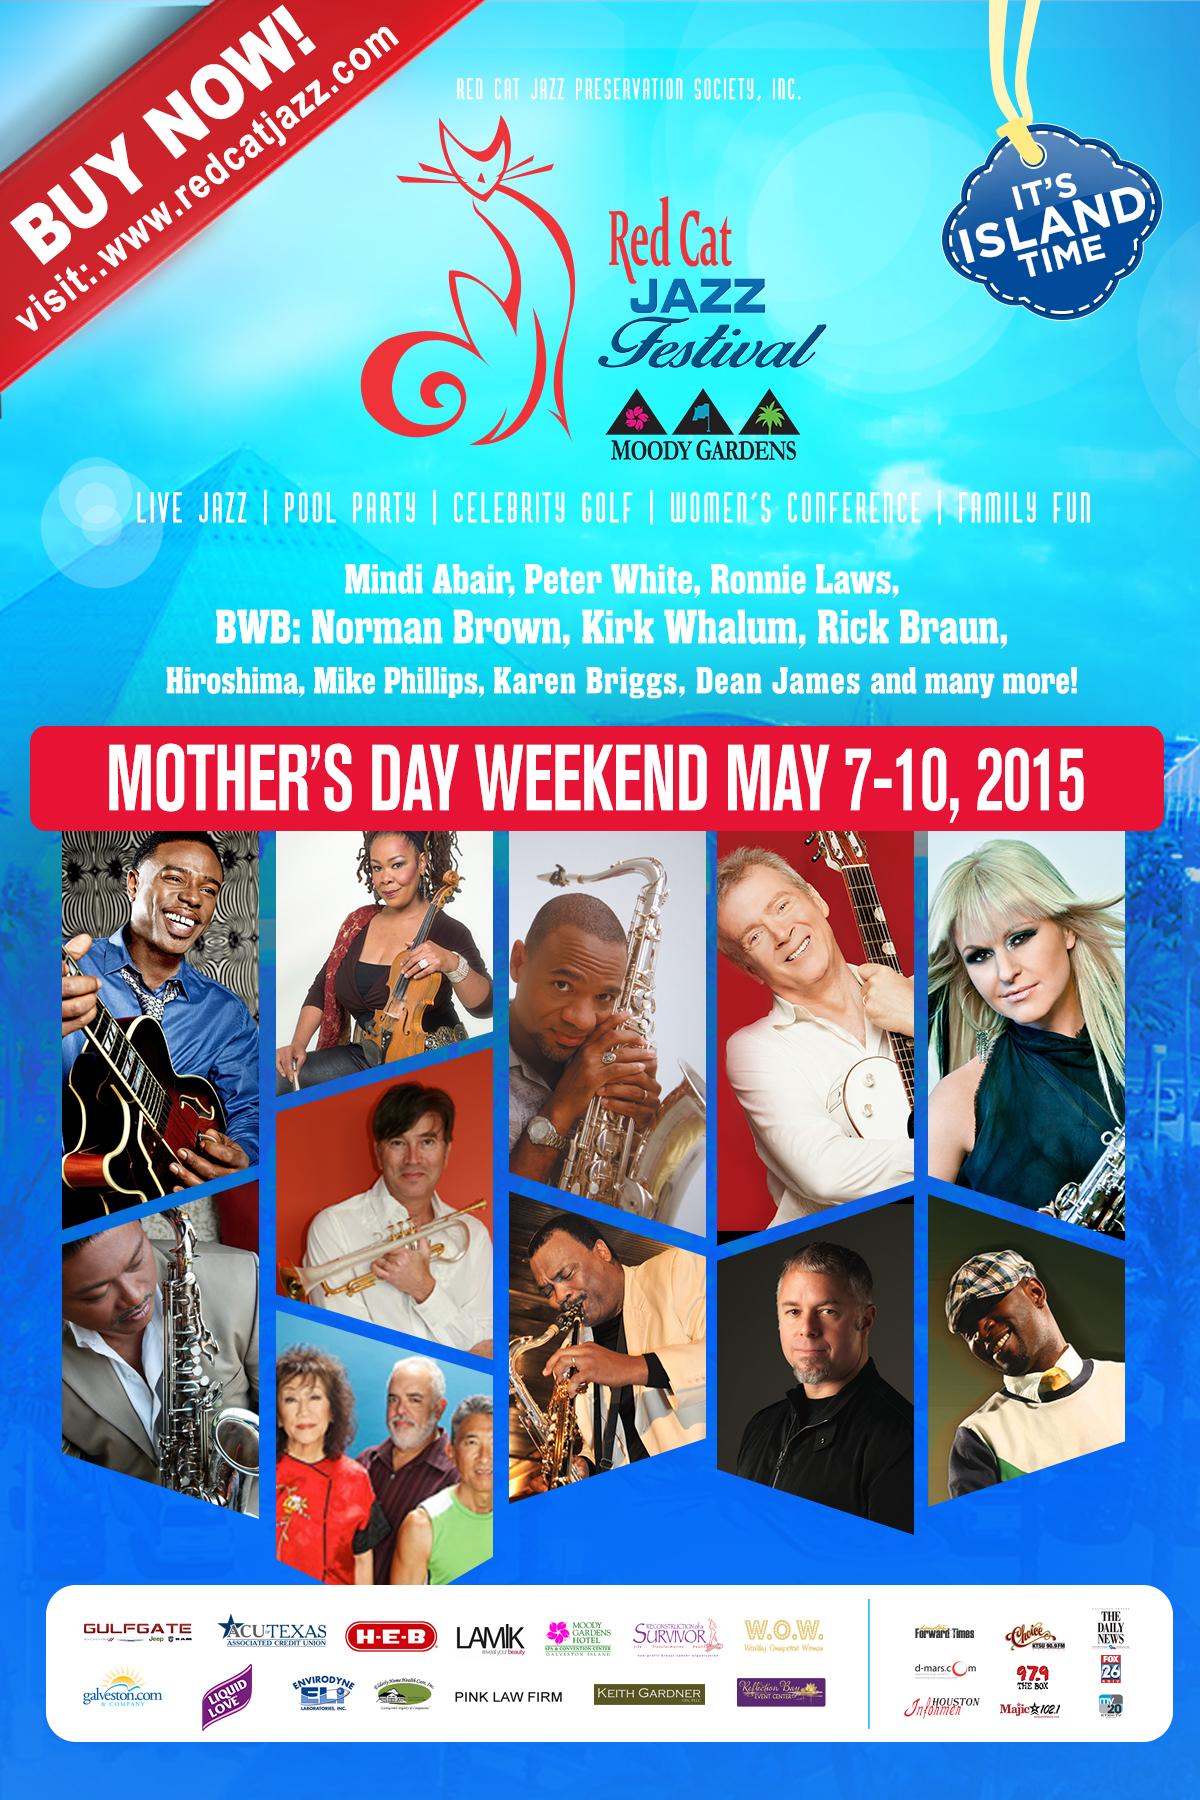 2015 Red Cat Jazz Festival at Moody Gardens - Houston